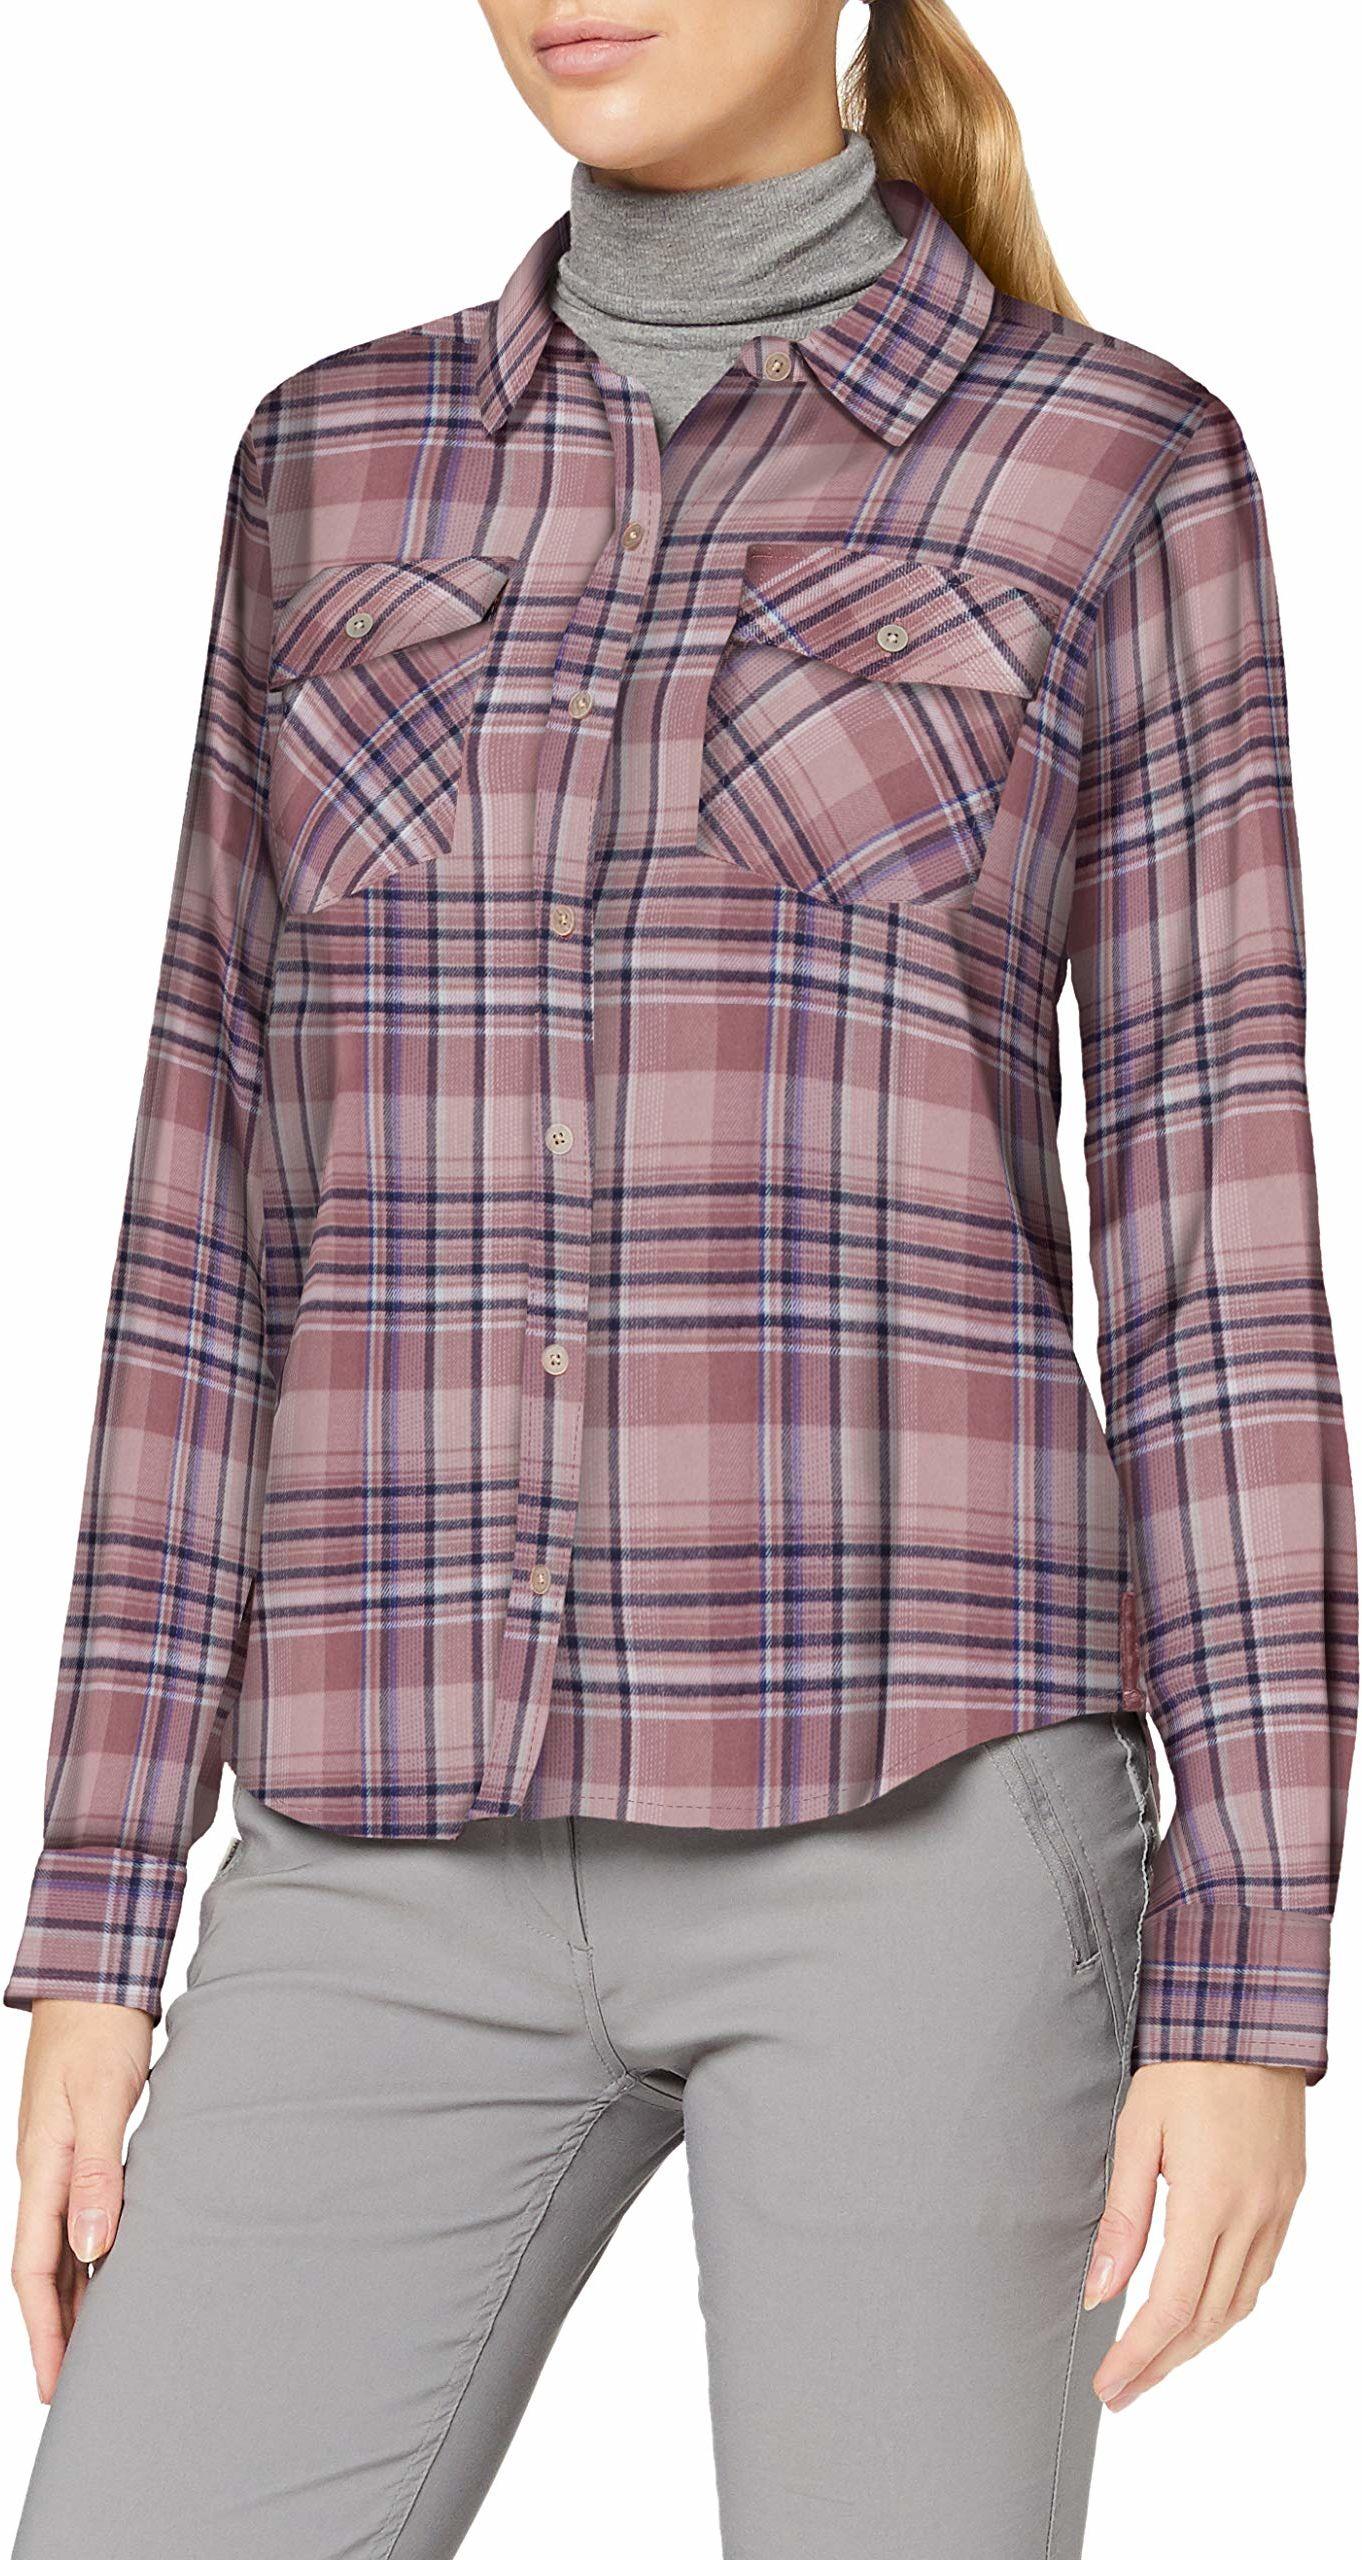 Marmot Damska koszulka Bridget Midwt flanelowa z długim rękawem, Dream State, L